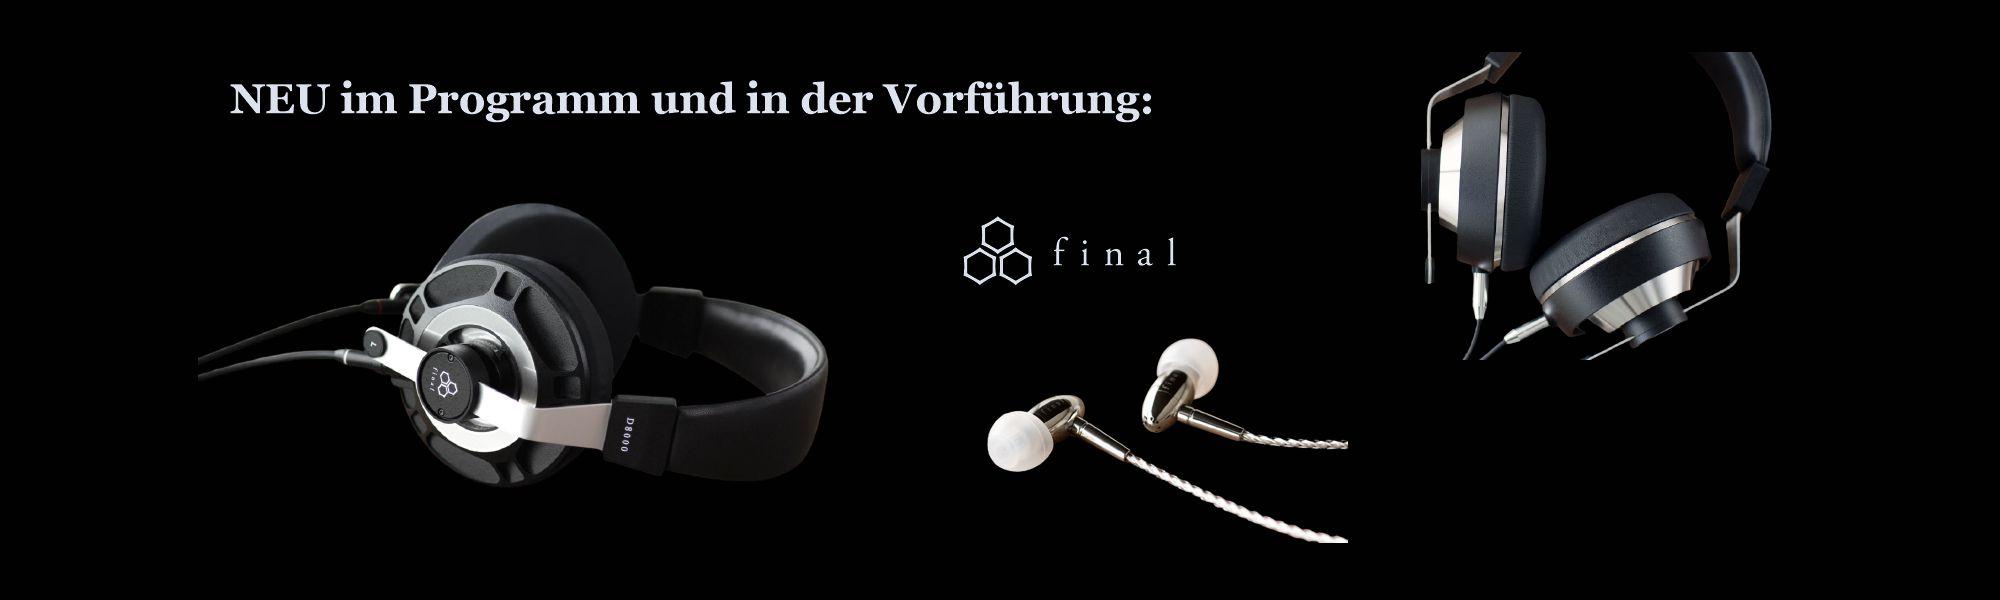 Final Kopfhörer